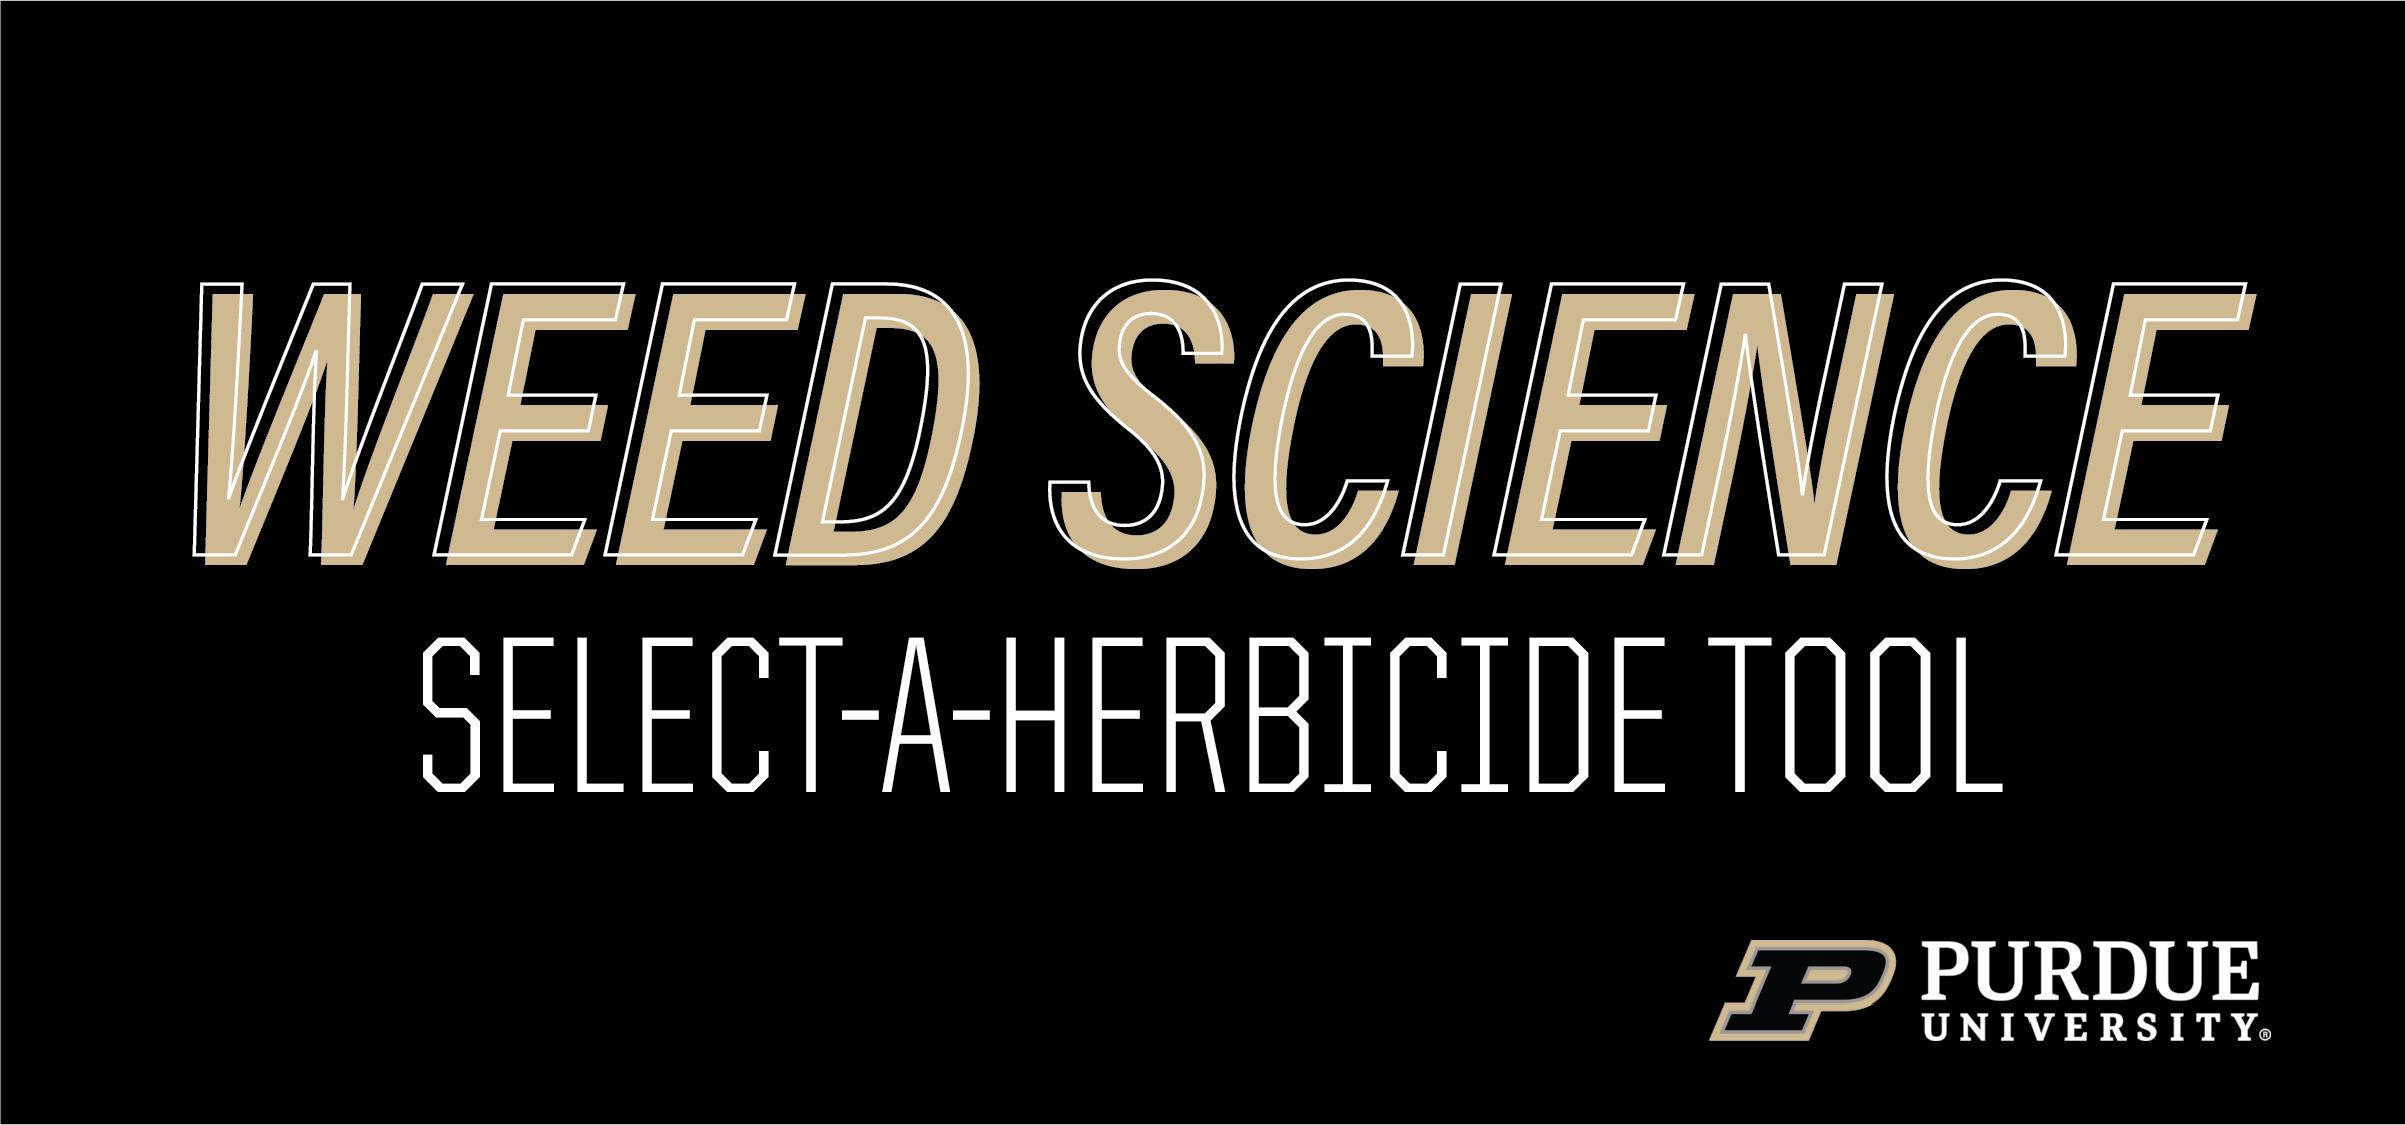 herbicide tool